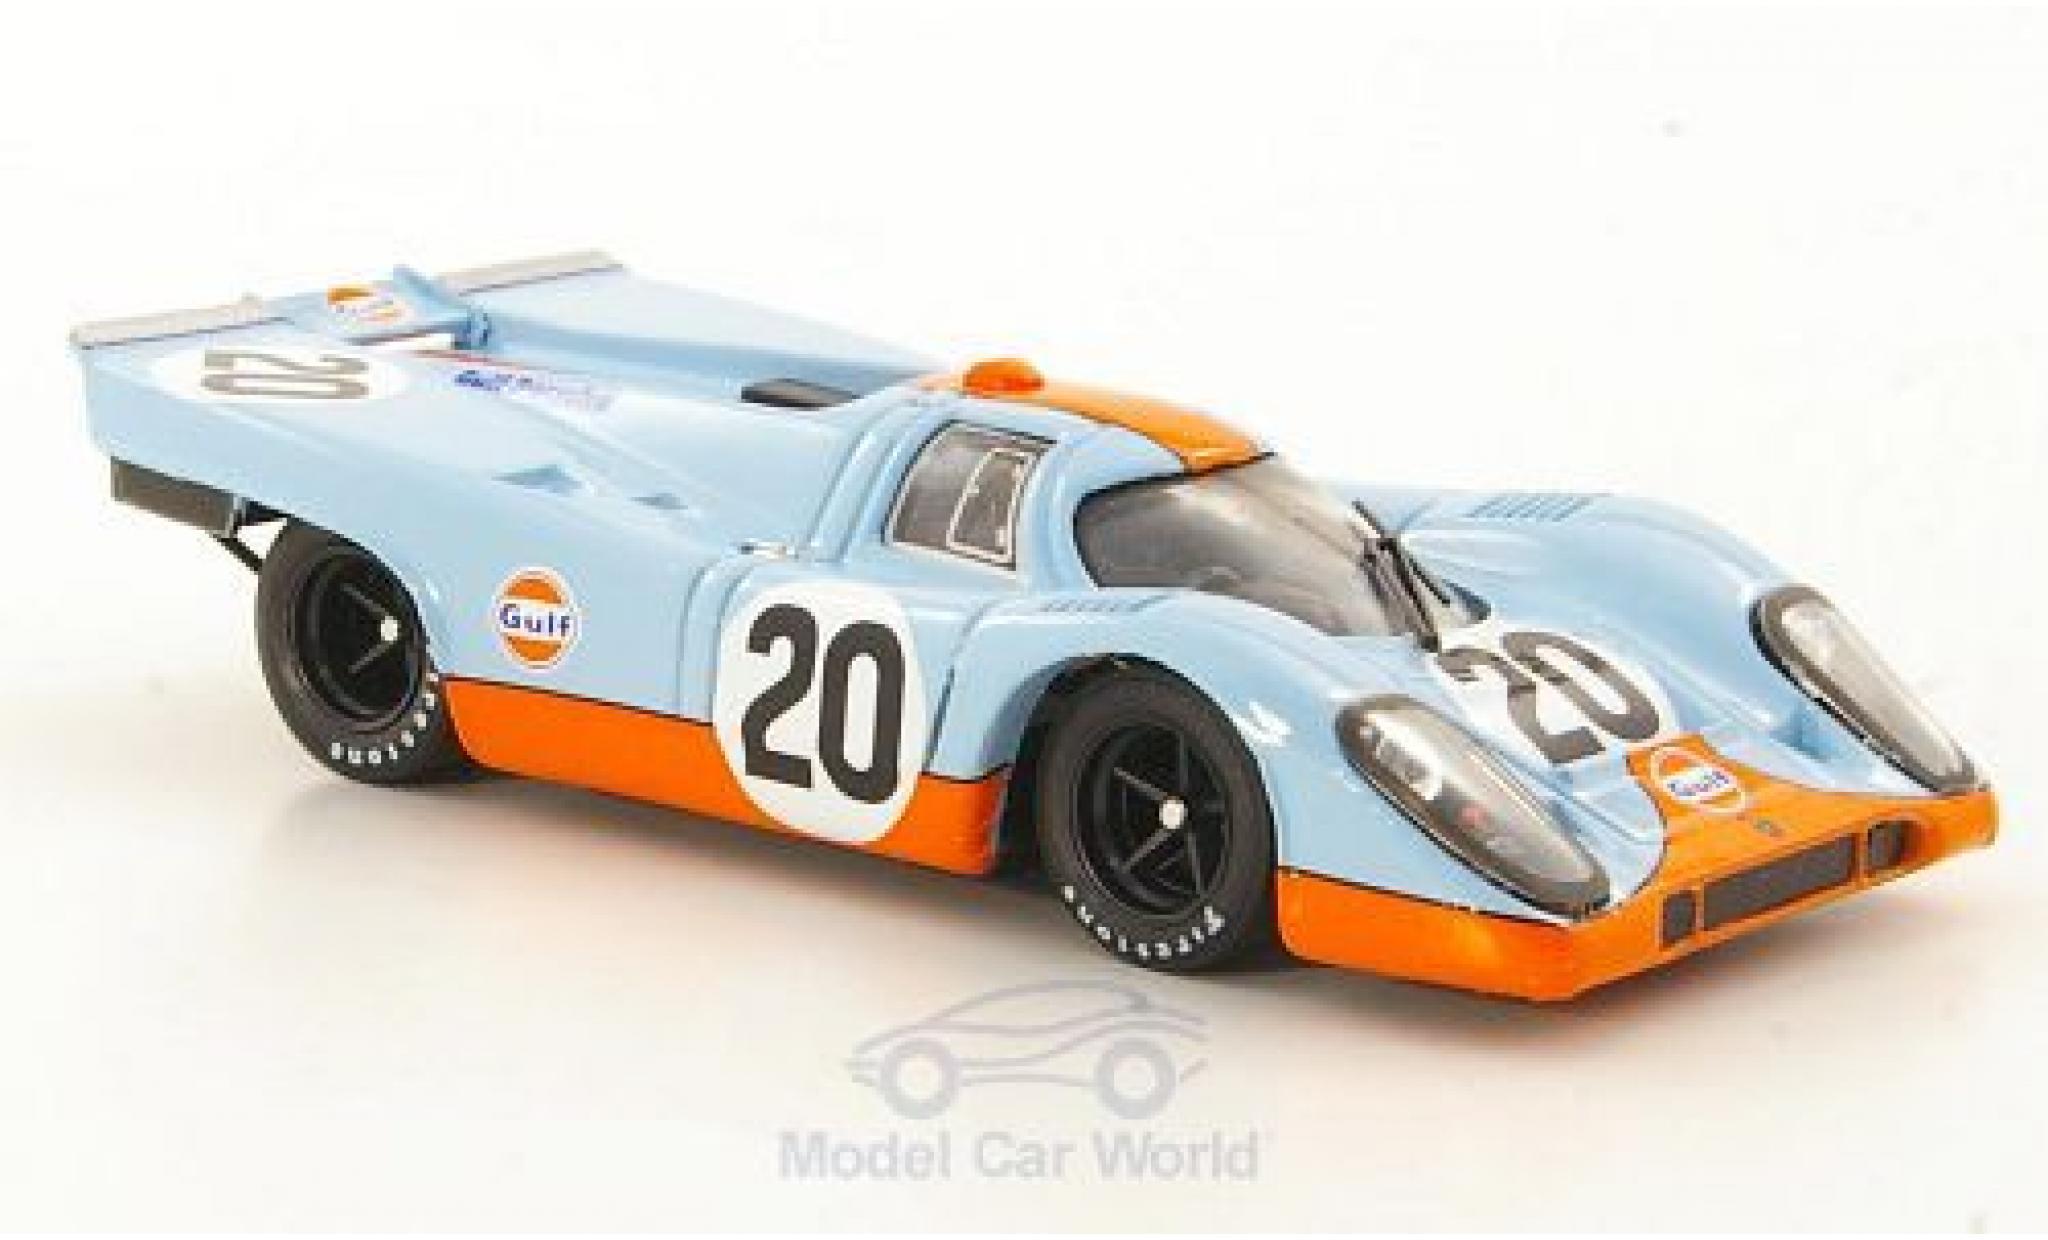 Porsche 917 1970 1/43 Brumm K No.20 JWA-Gulf Racing Team 24h Le Mans J.Siffert/B.Redman ohne Vitrine